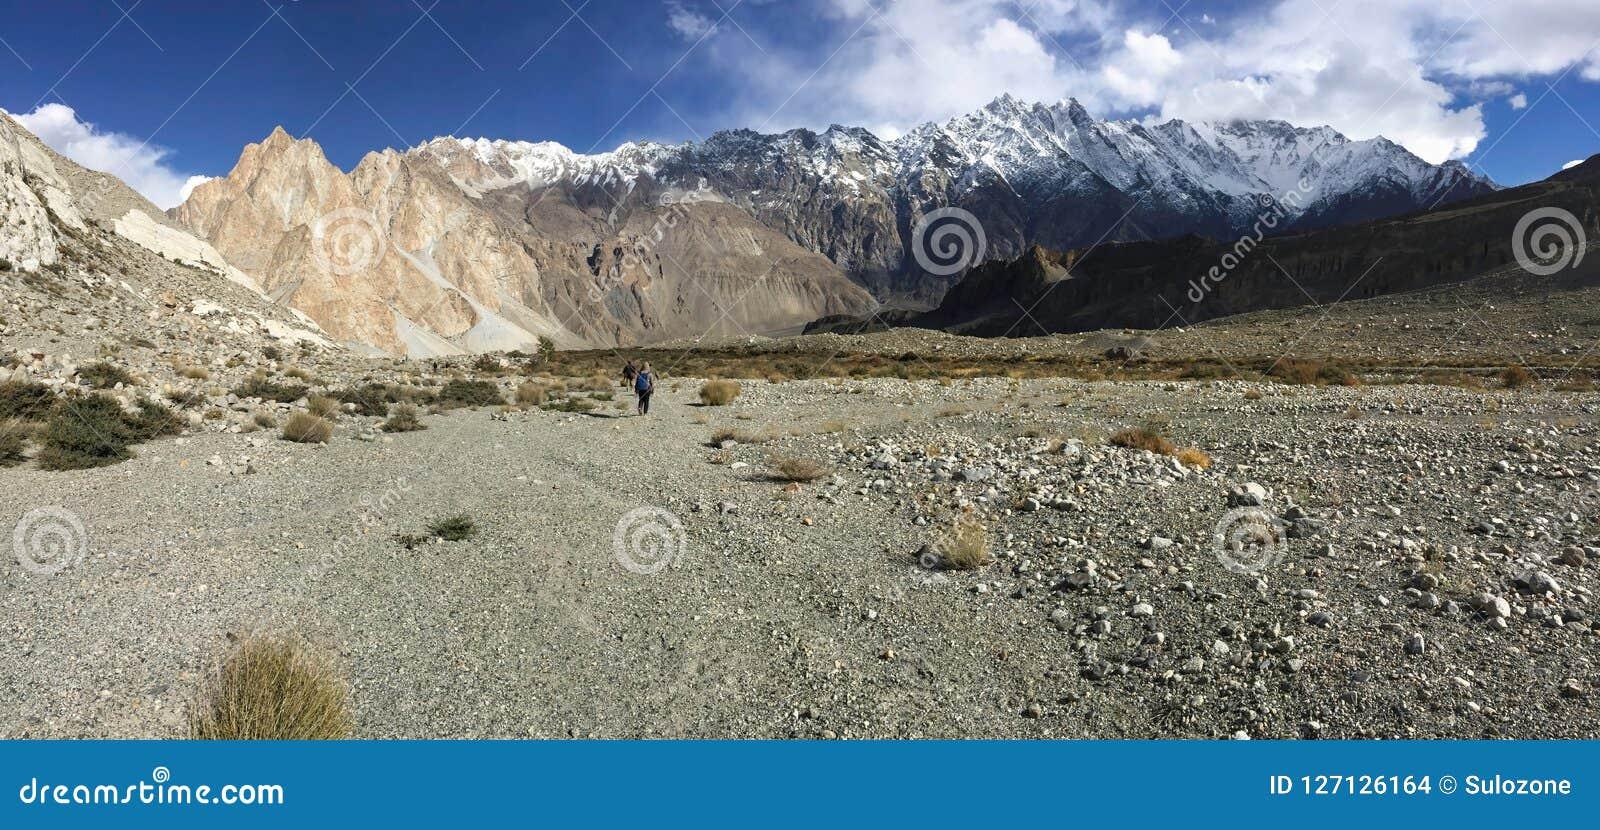 Trekking trail in Passu show drought landform, snow capped mountains in Karakoram range.